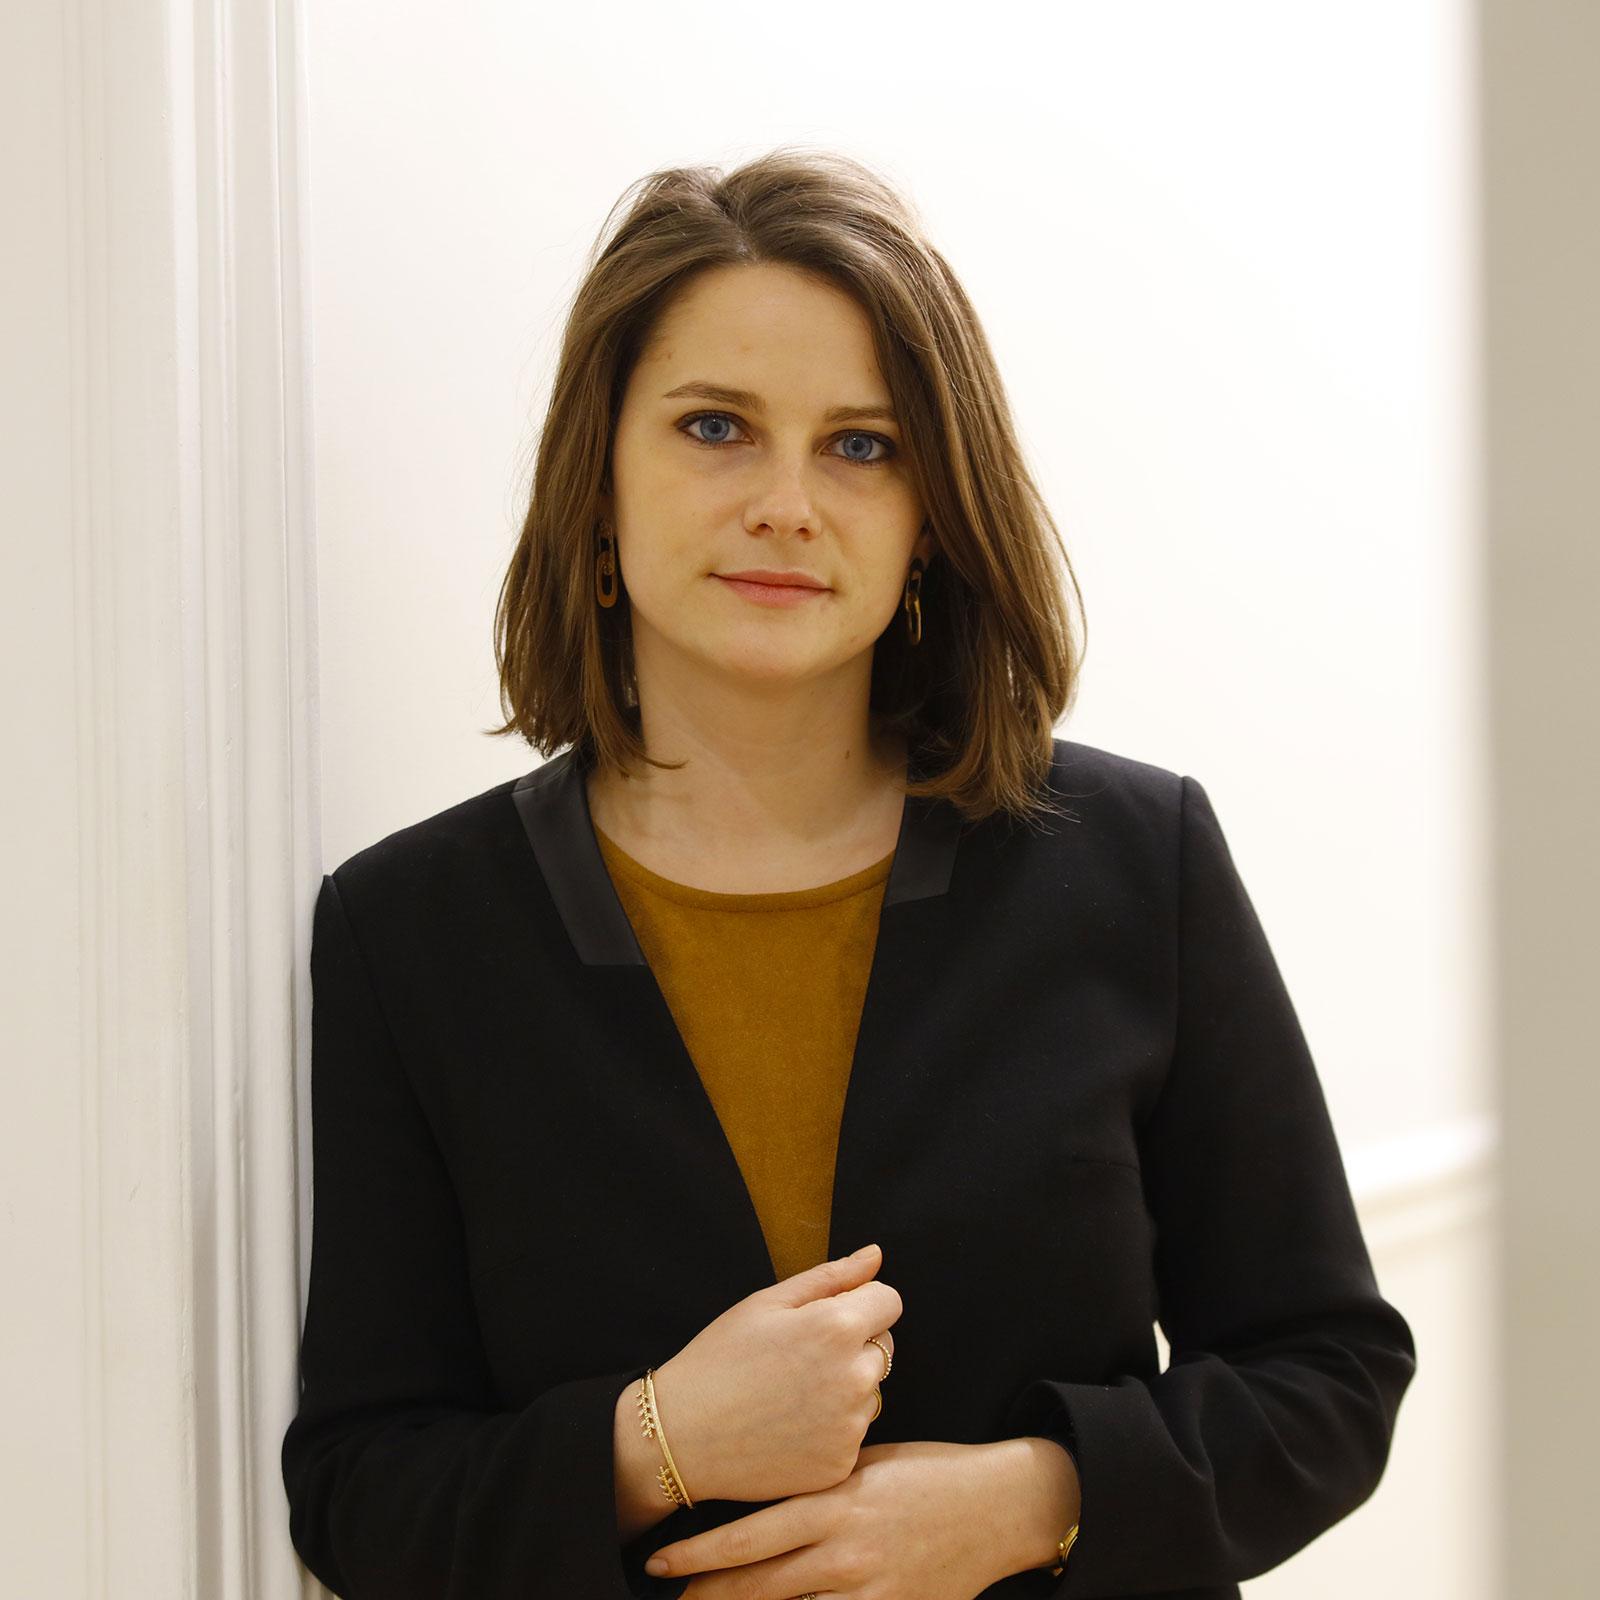 Camille Chastagner